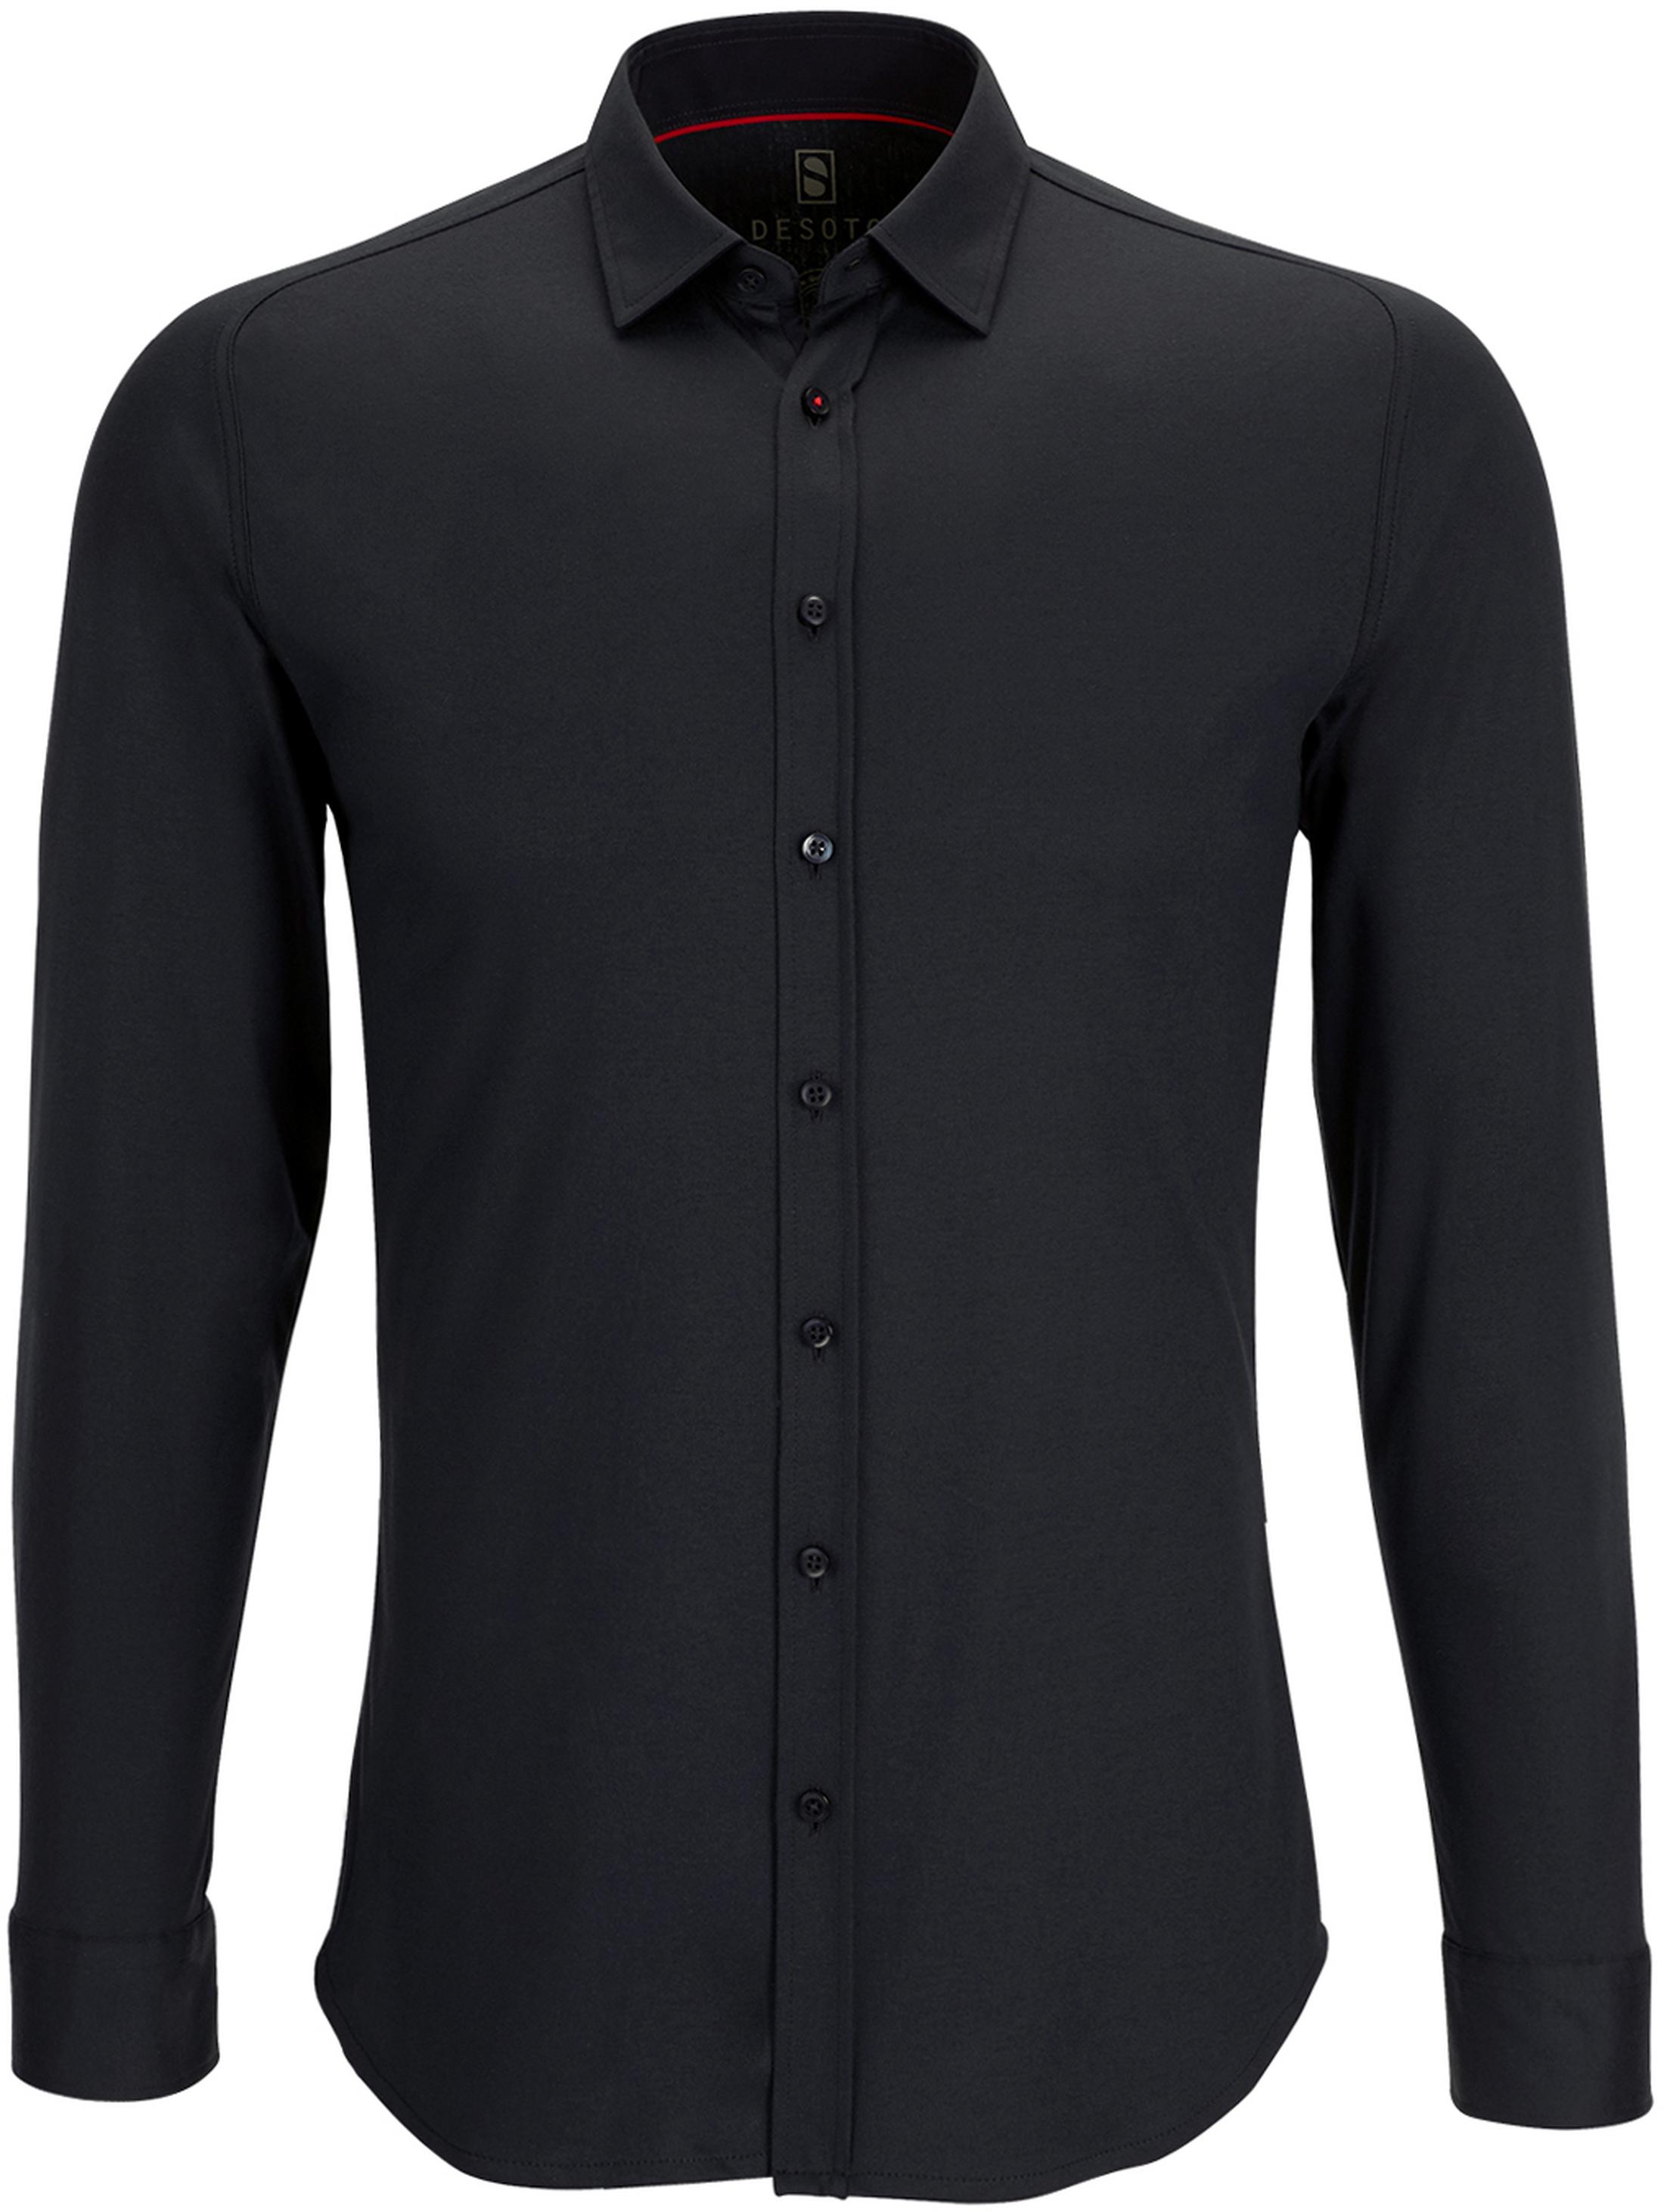 Desoto Shirt Non Iron Black foto 0